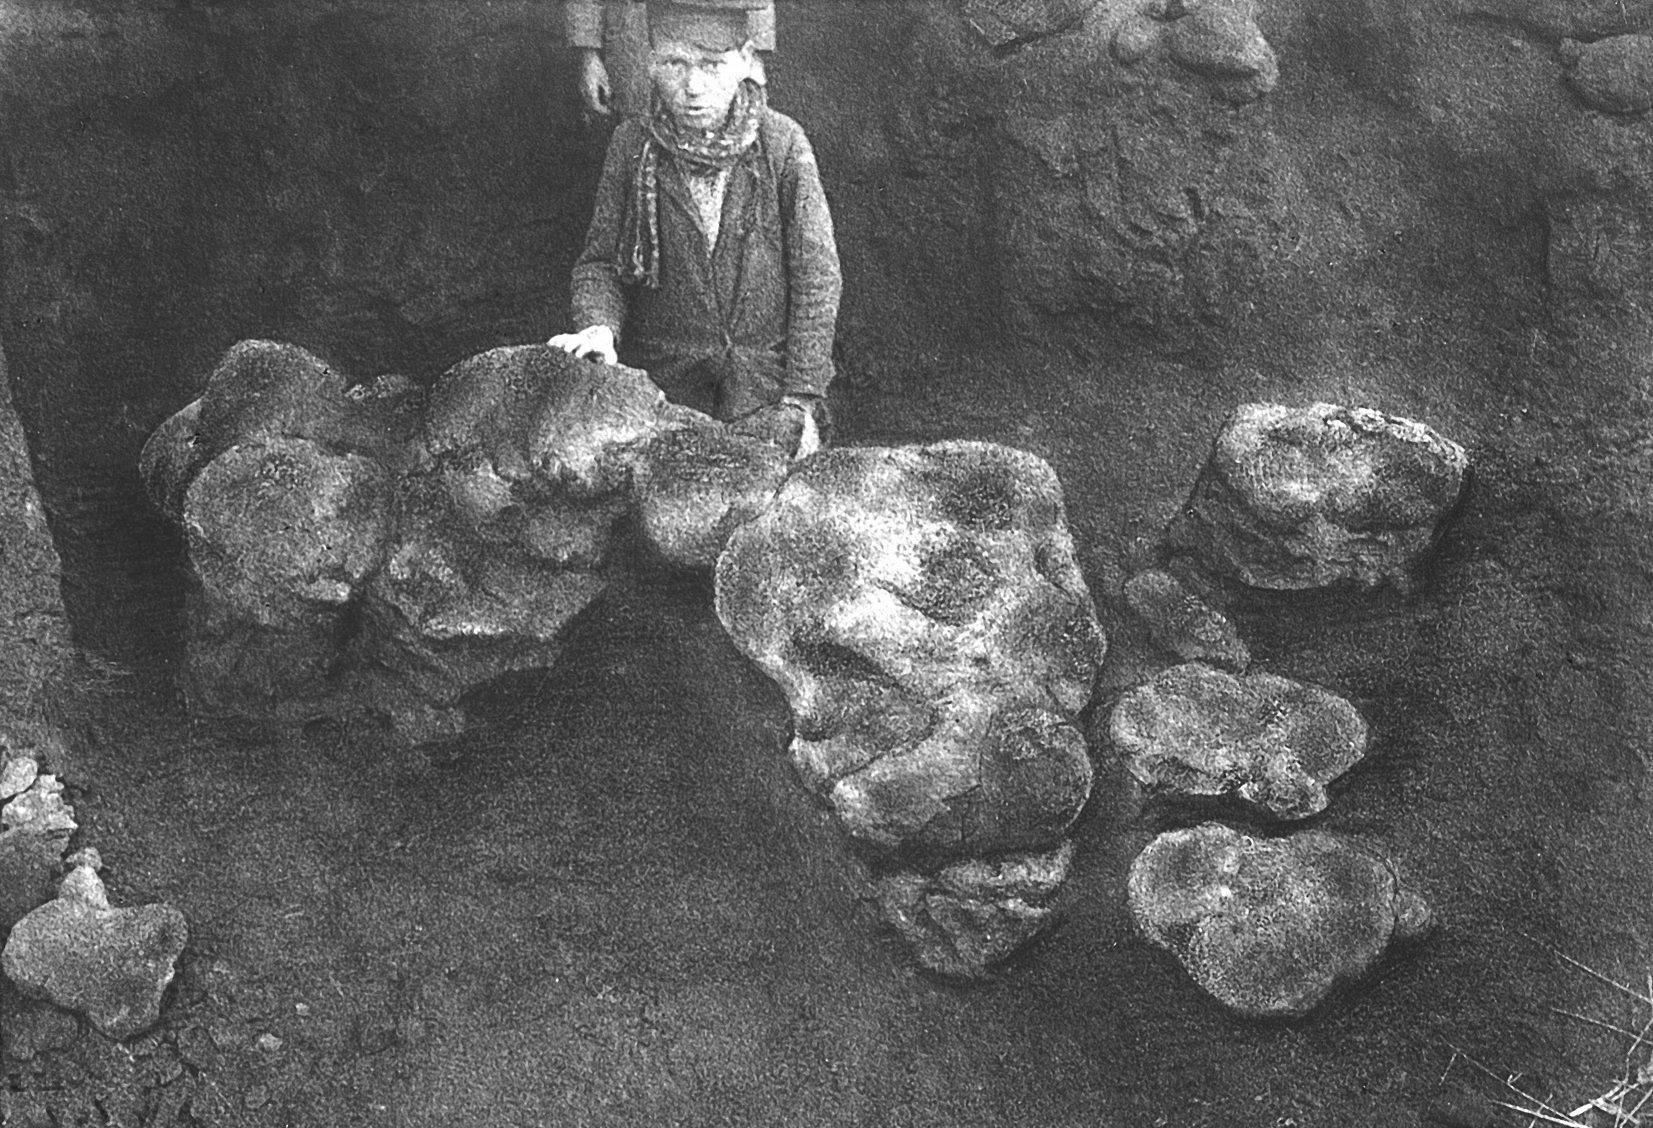 Конкреция с черепом парейазавра. Фото В. П. Амалицкого